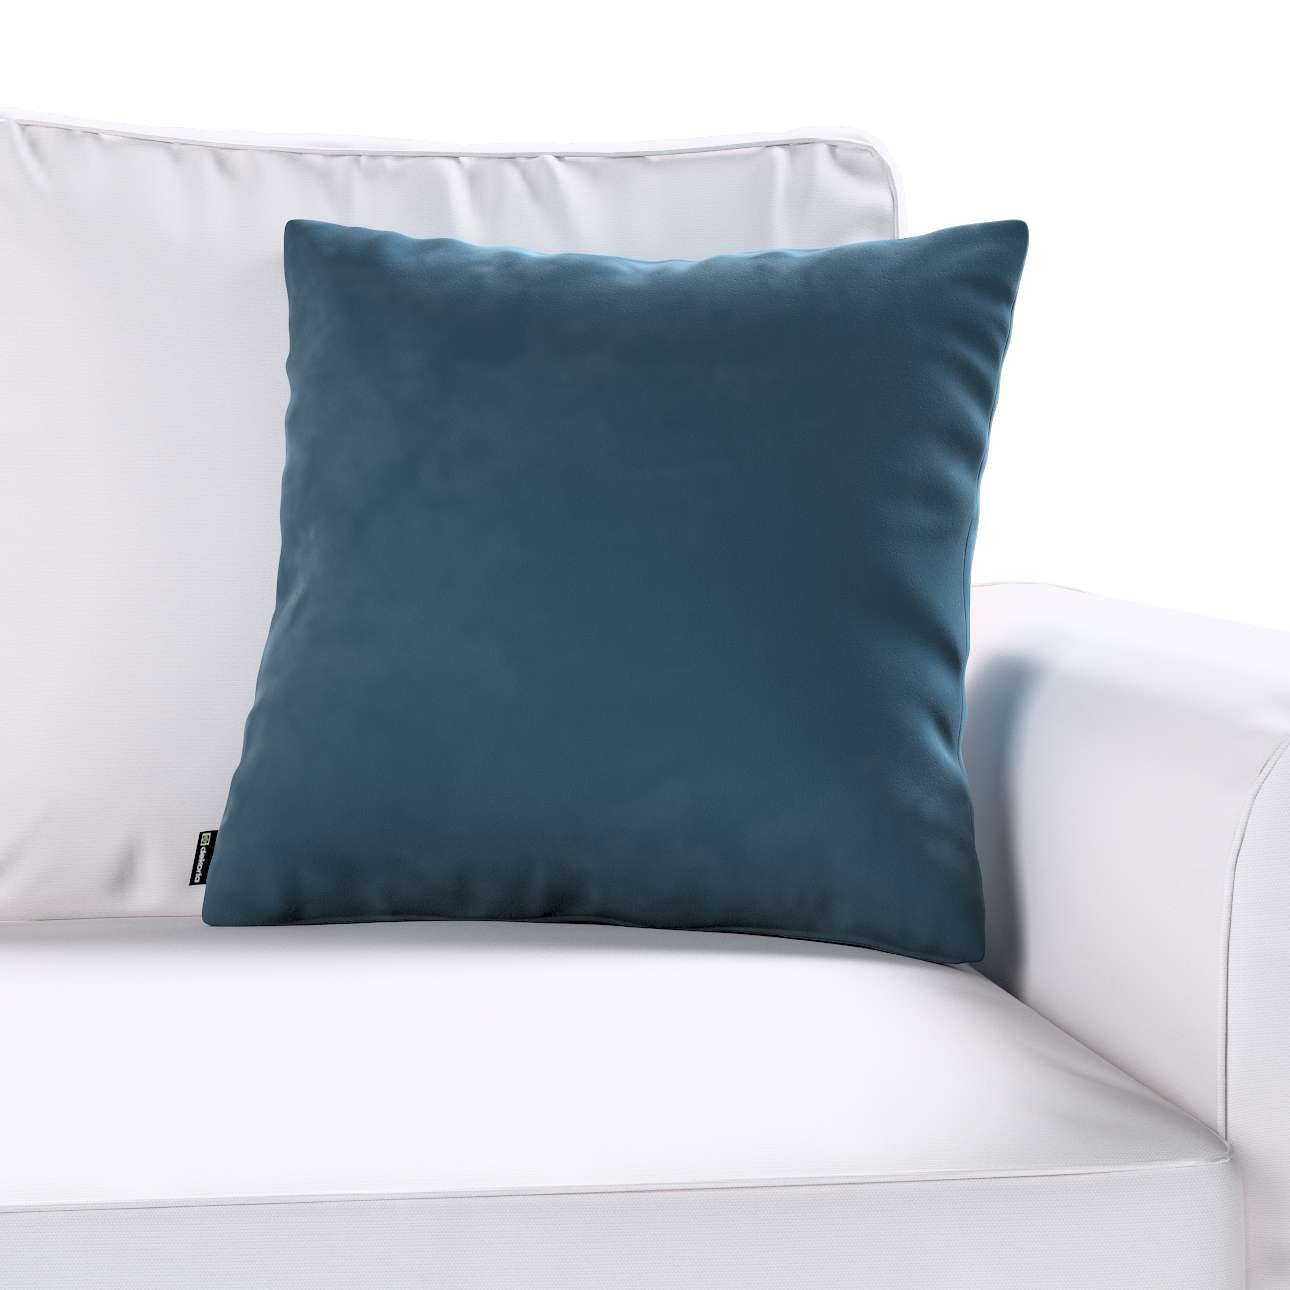 Kuddfodral standard 45 × 45 cm i kollektionen Velvet, Tyg: 704-16